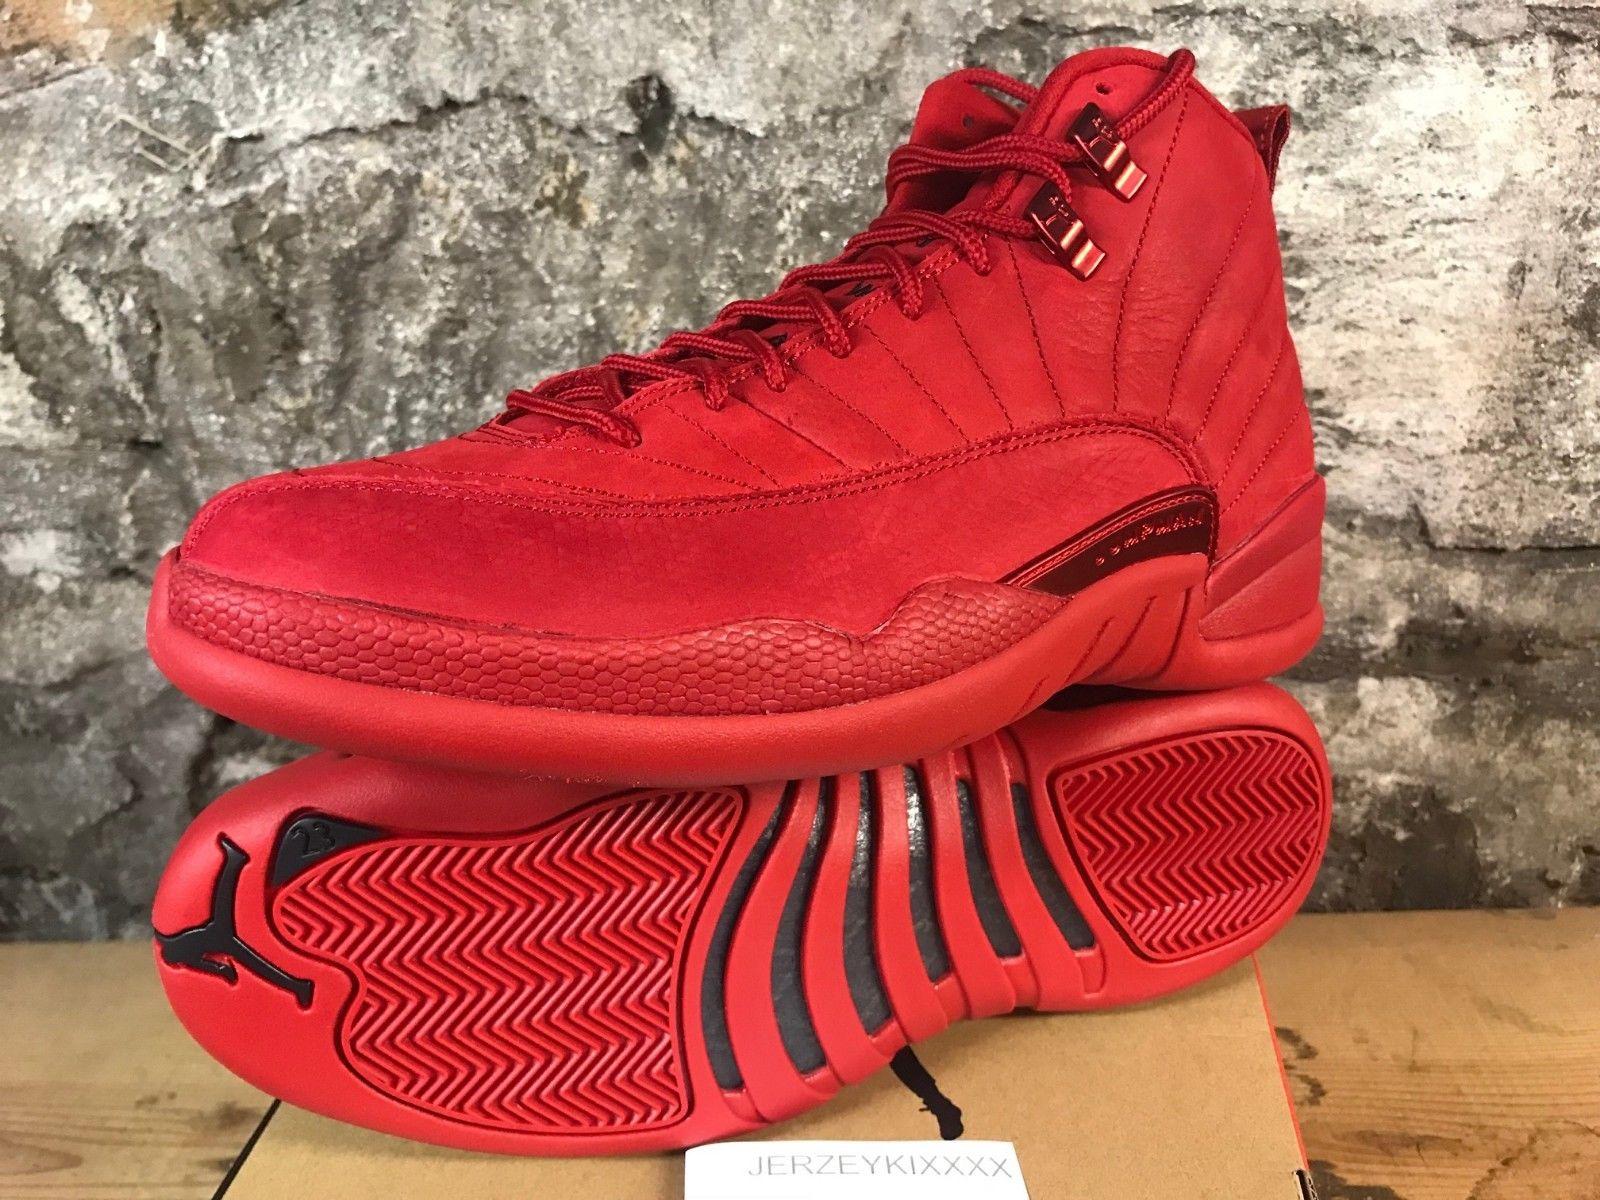 852ccfbfa68266 Air Jordan 12 Gym Red 130690-601 Available Now